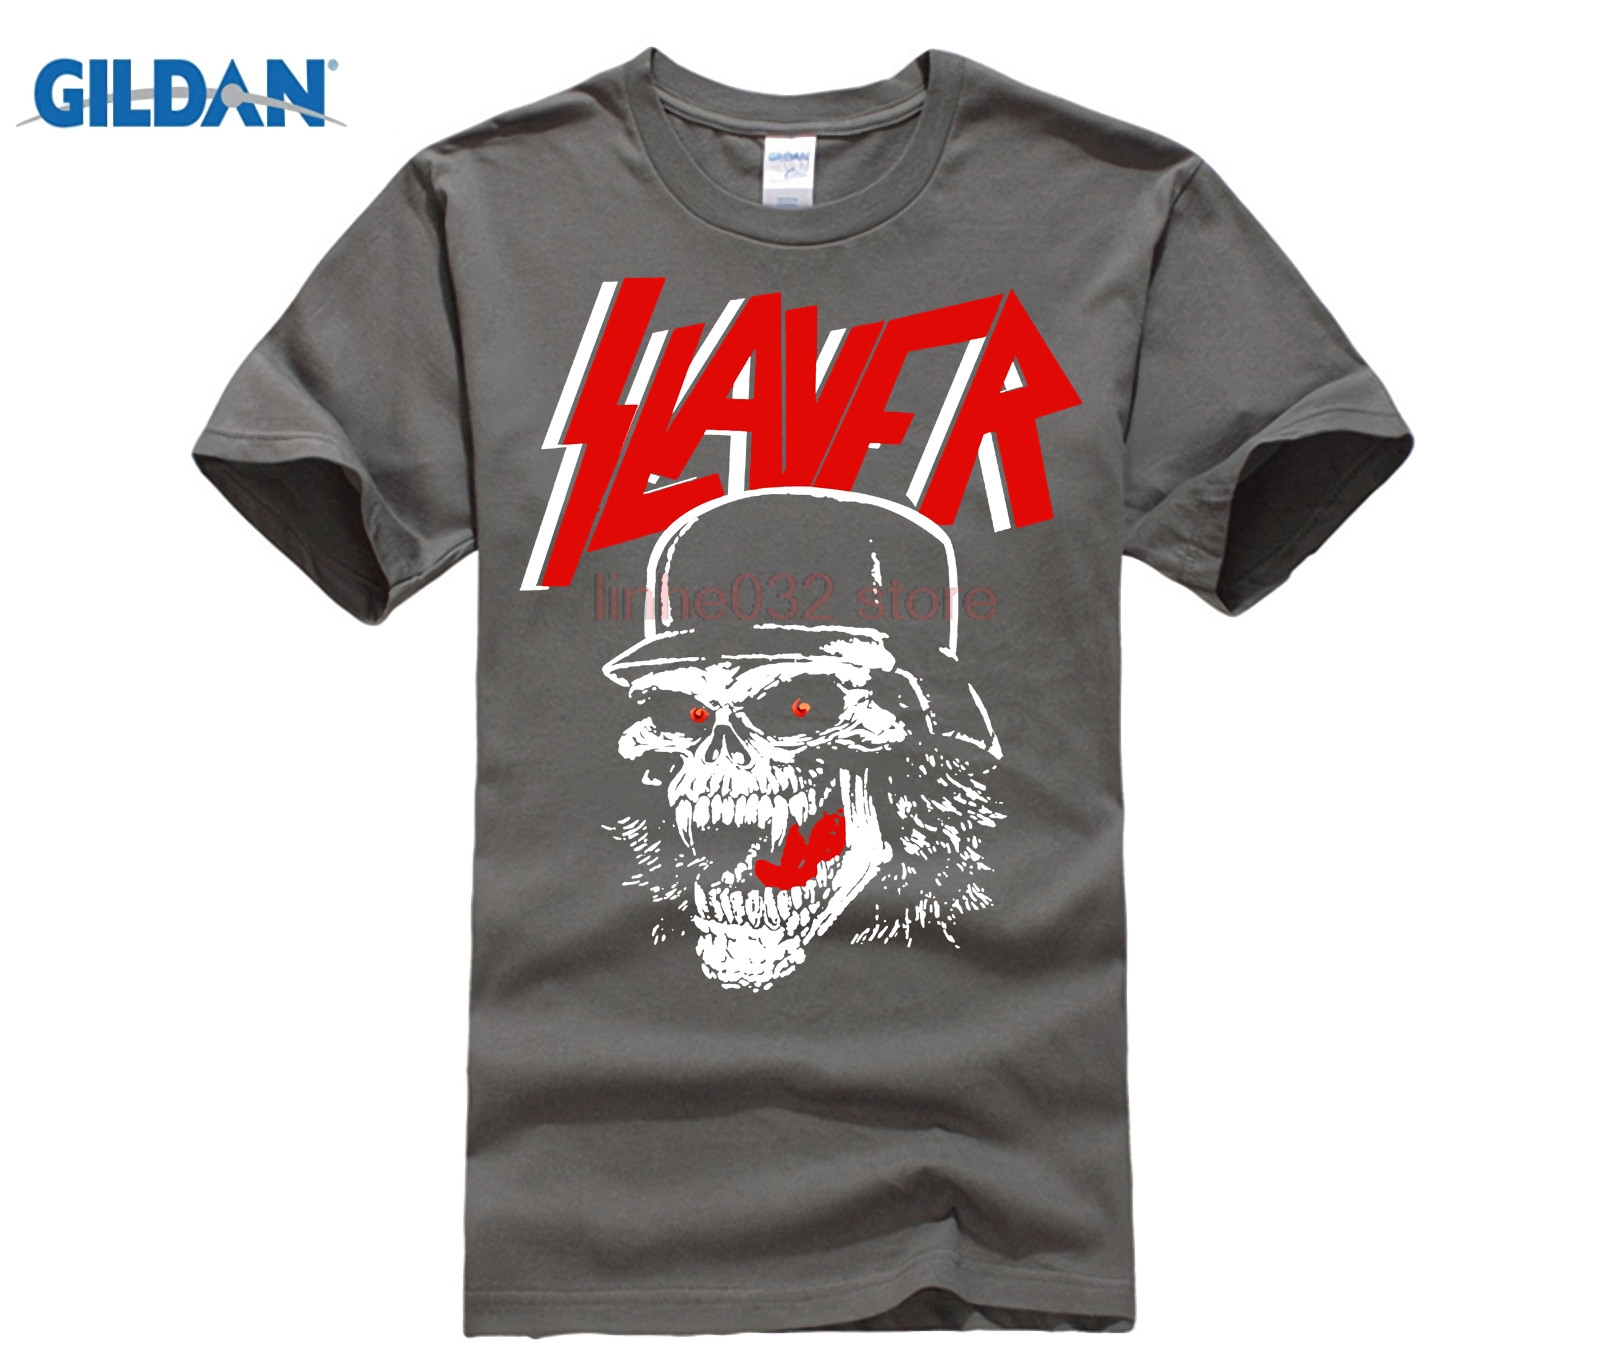 Gildan Plus Size Black Slayer T Shirt Mens British Style -1688